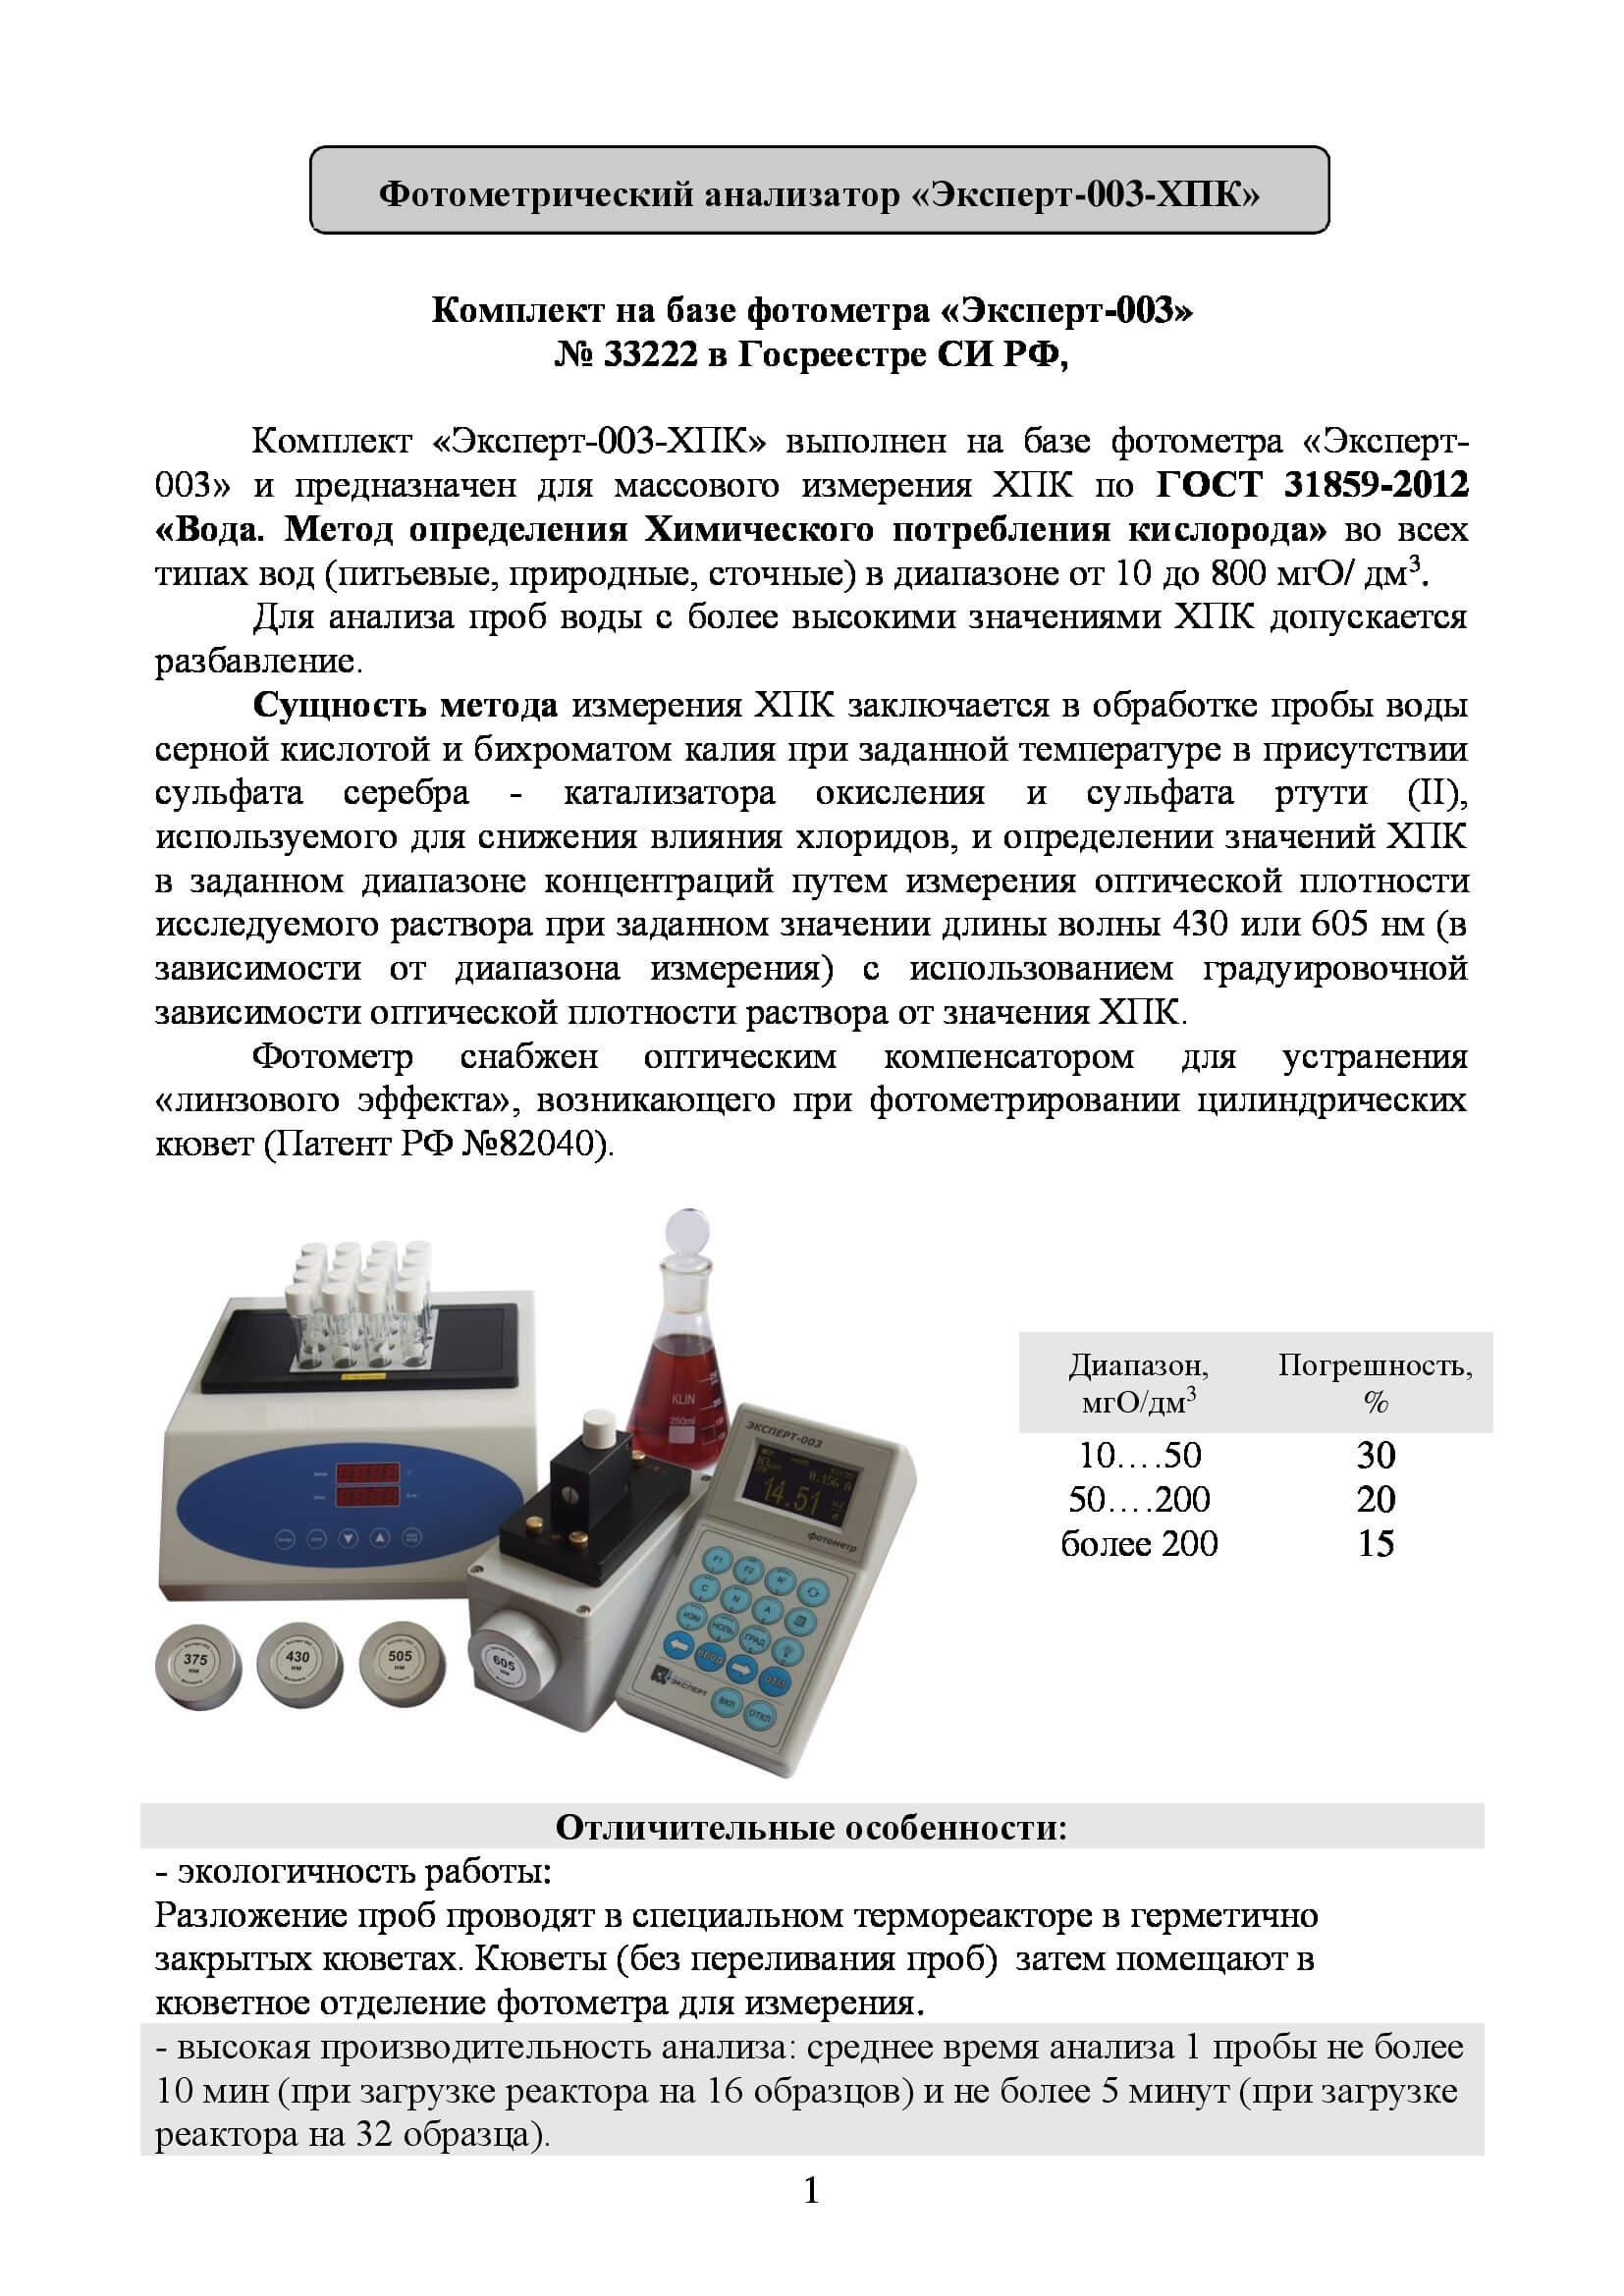 e398986b1948355c52ef1ecd4c6643d8-0